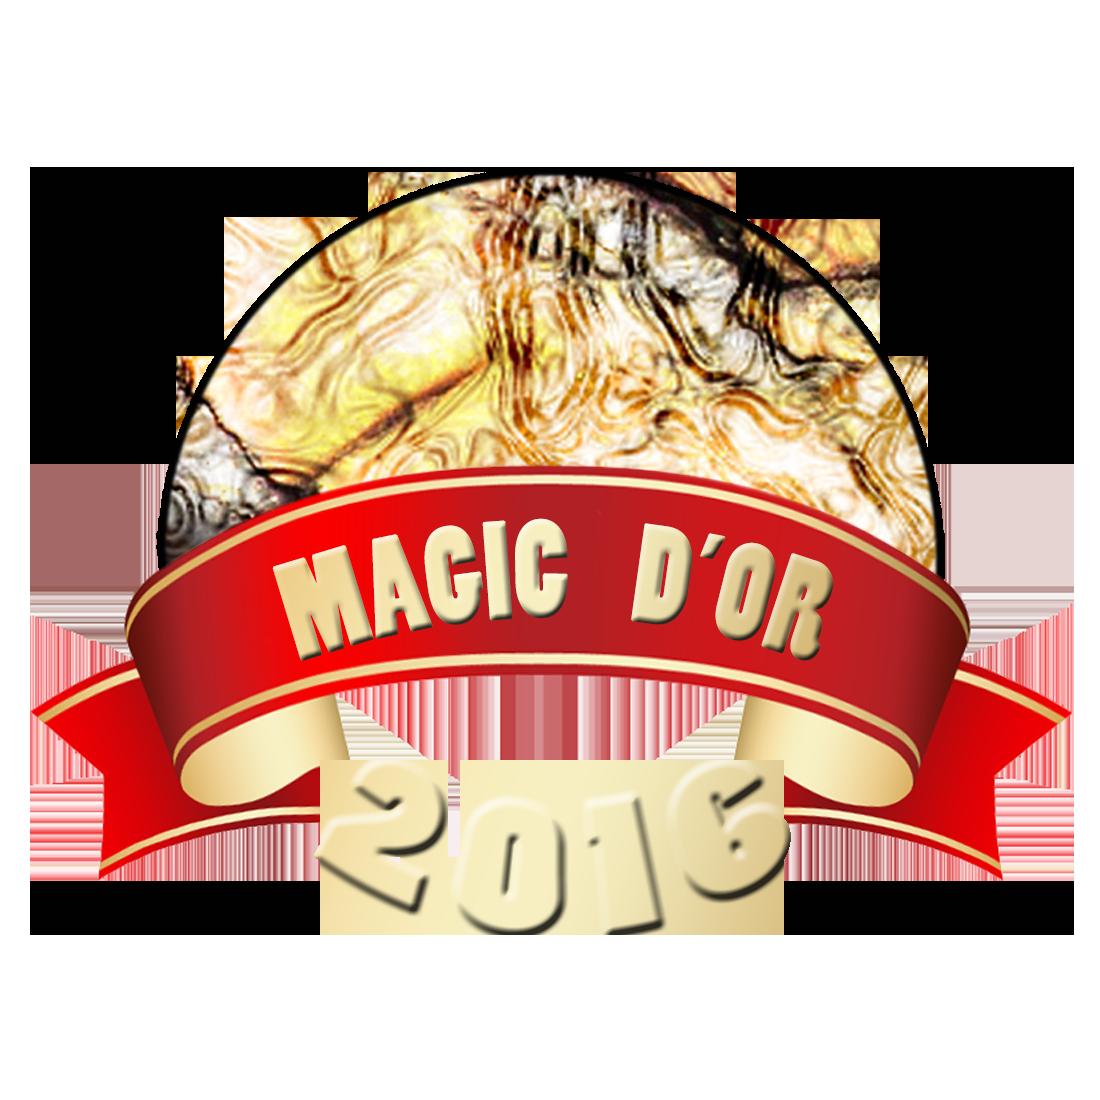 Magic D'or 2016